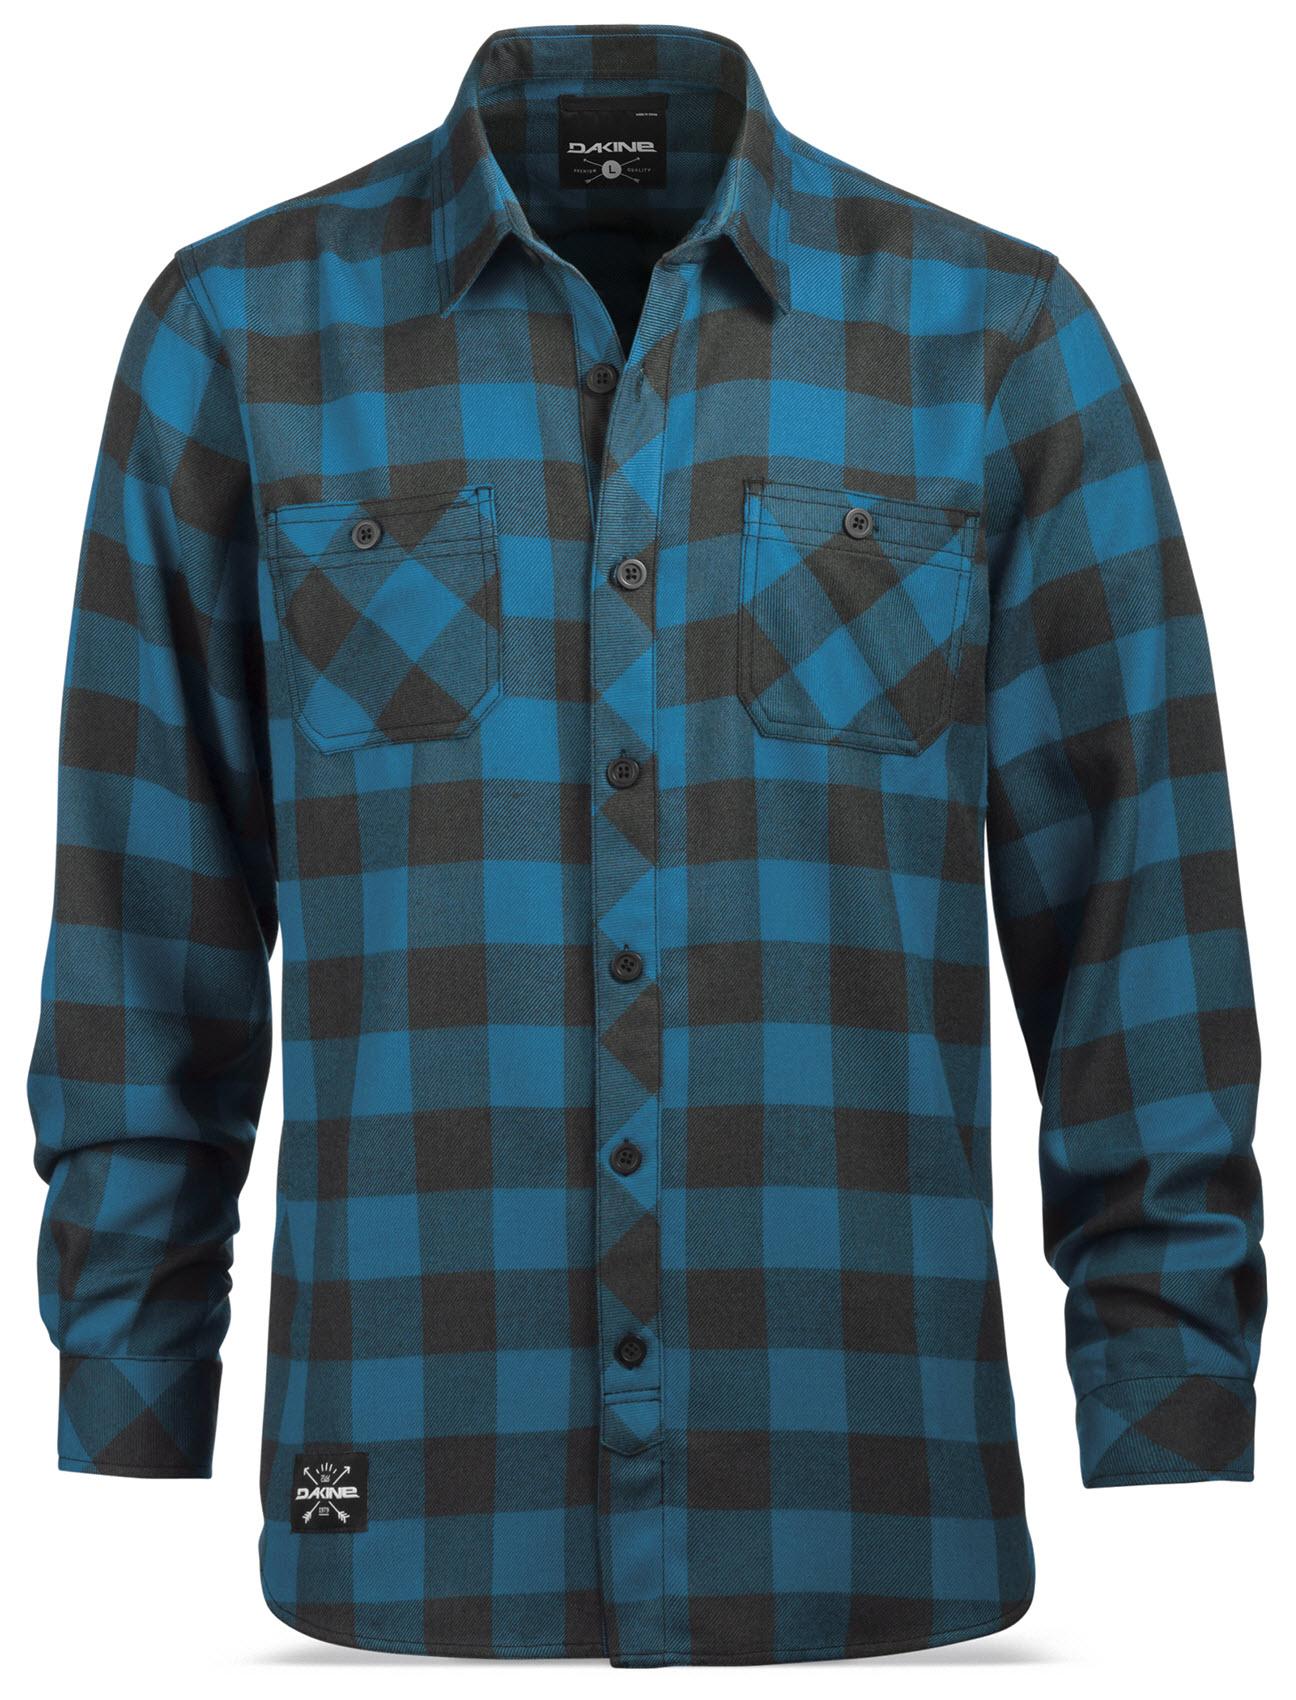 Dakine Shirt - Underwood Flannel Shirt - Button Closure, Odor Control Control Odor Technology 947926